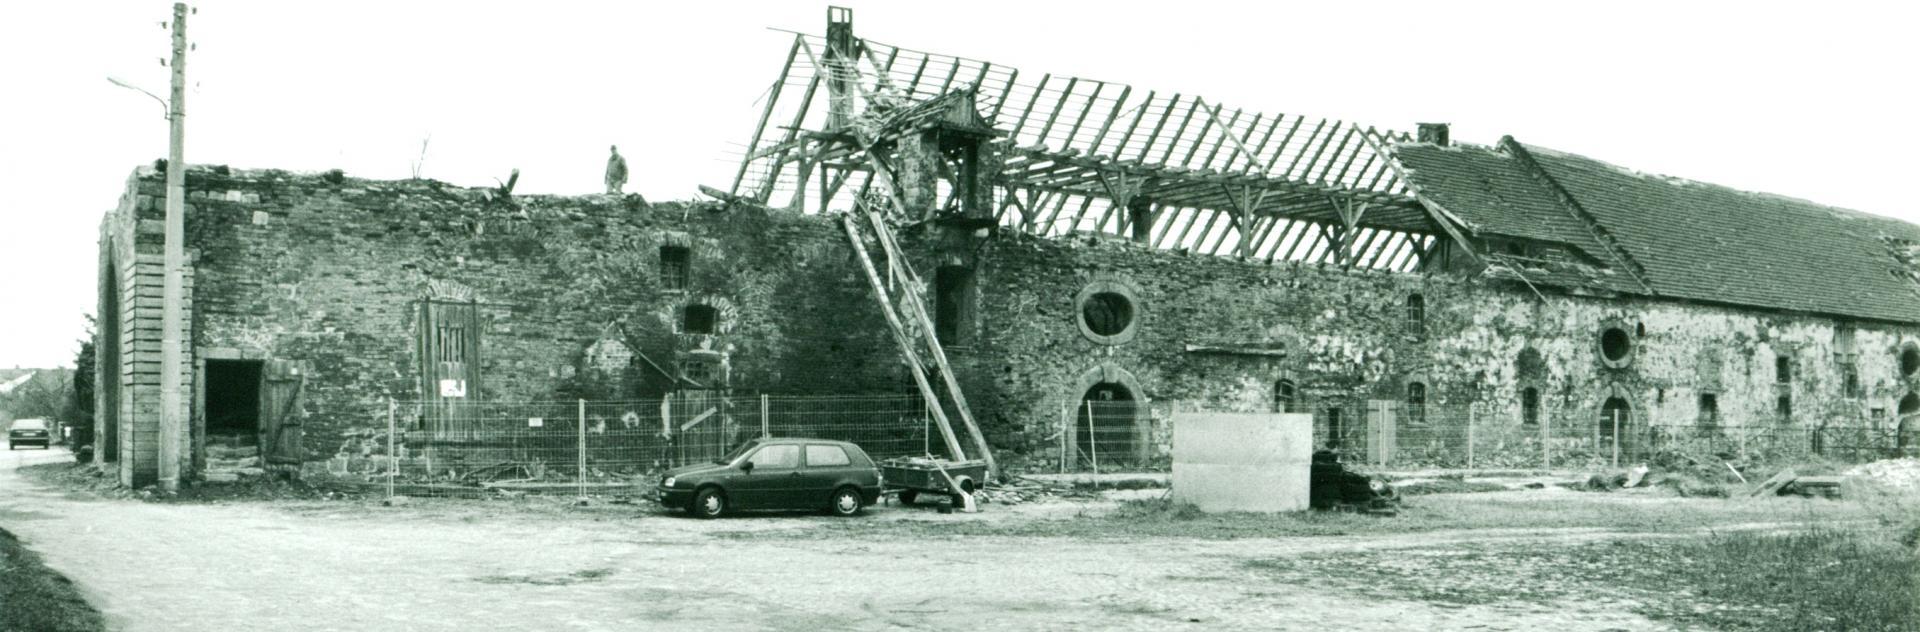 Zerstörung 2002